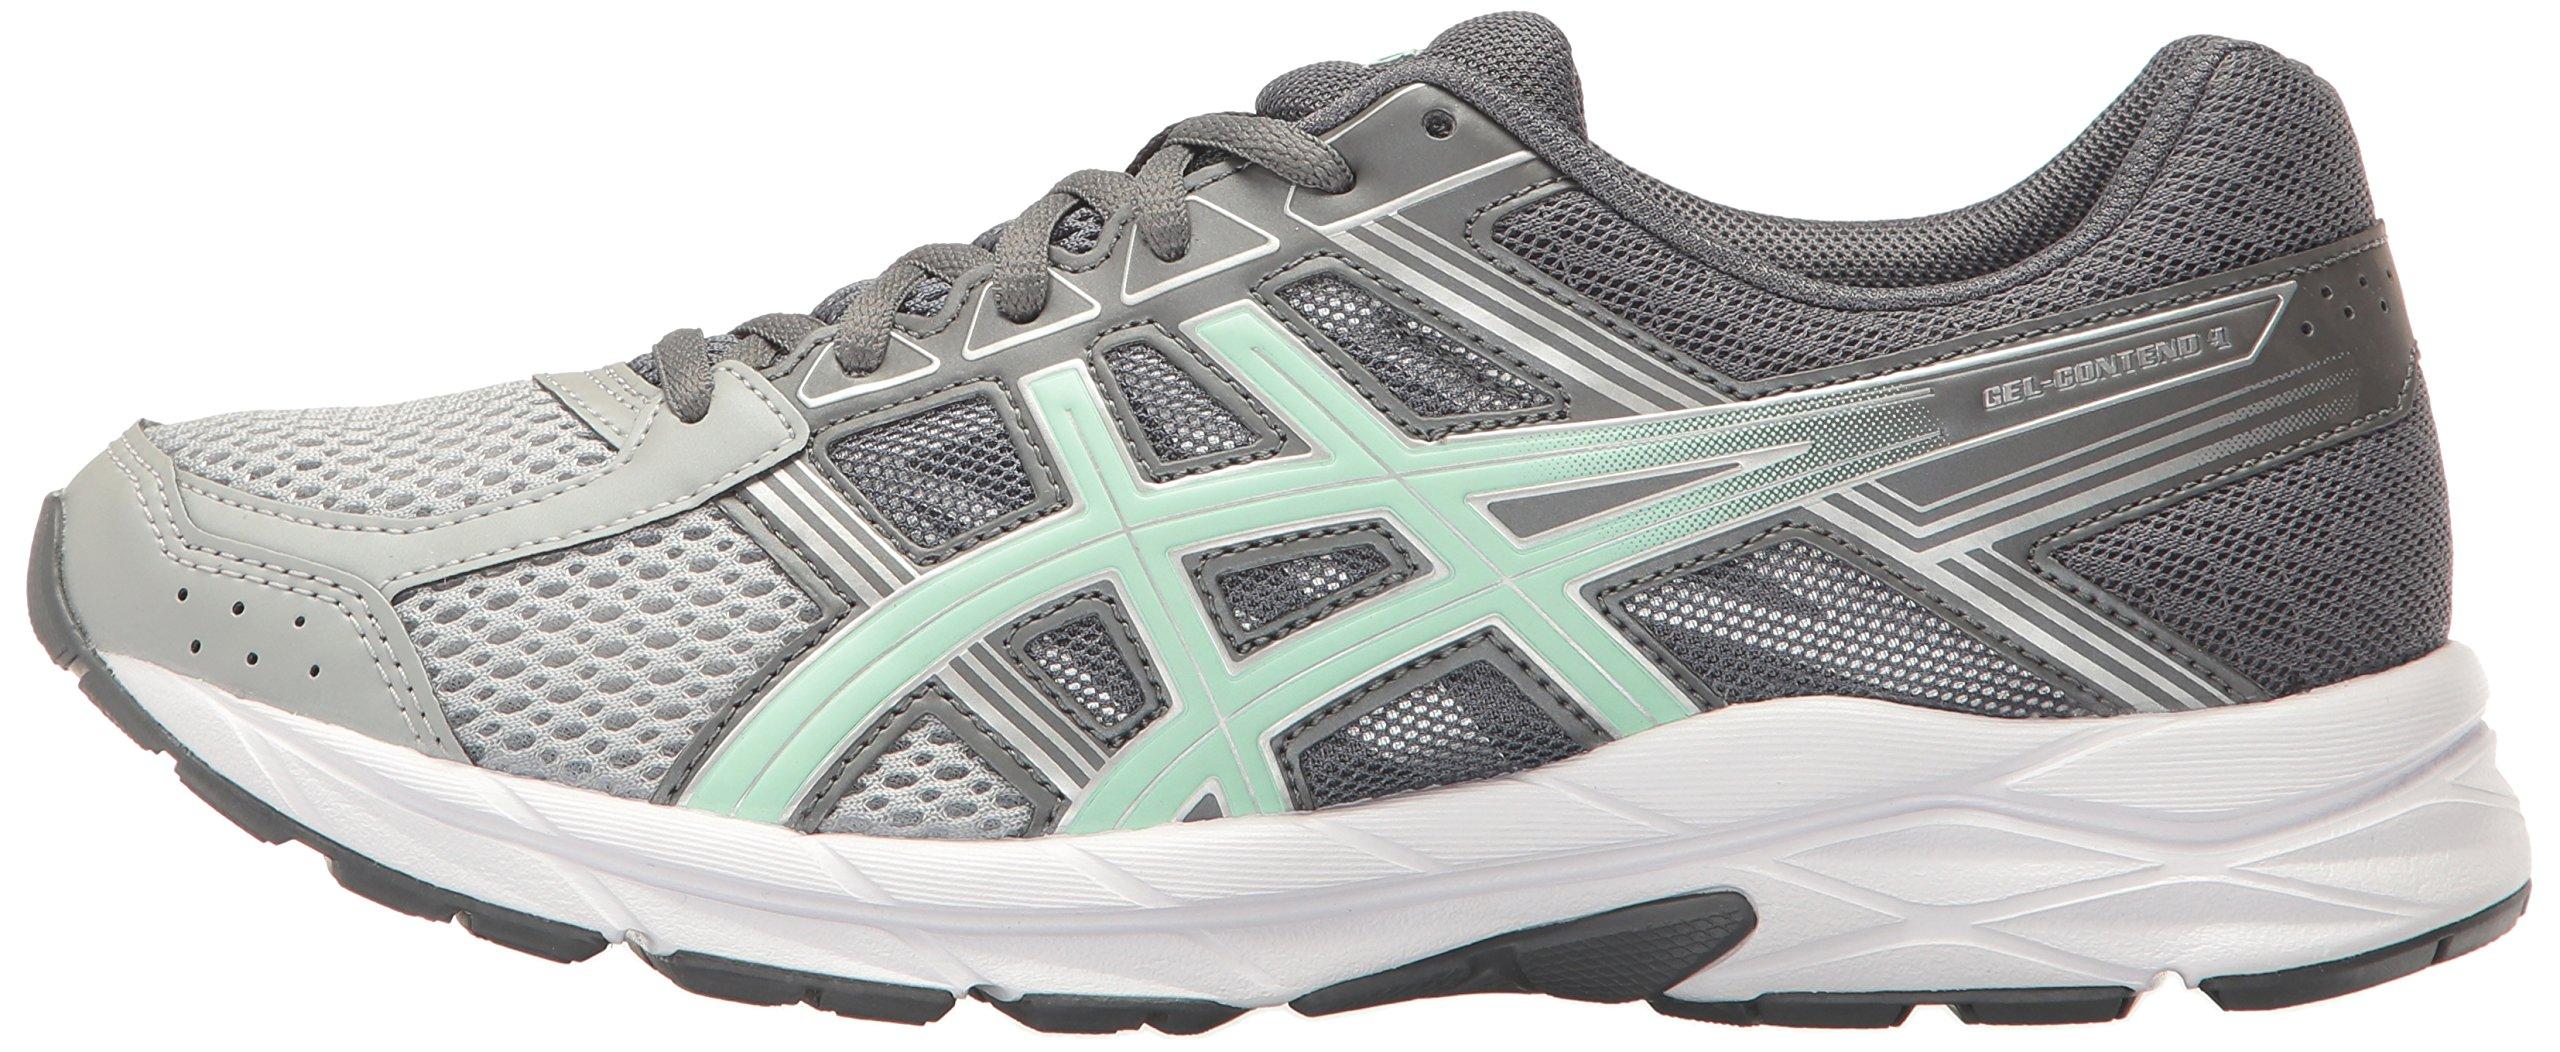 ASICS Womens Gel-Contend 4 Running Shoe, Mid Grey/Glacier Sea/Silver, 5 Medium US by ASICS (Image #5)